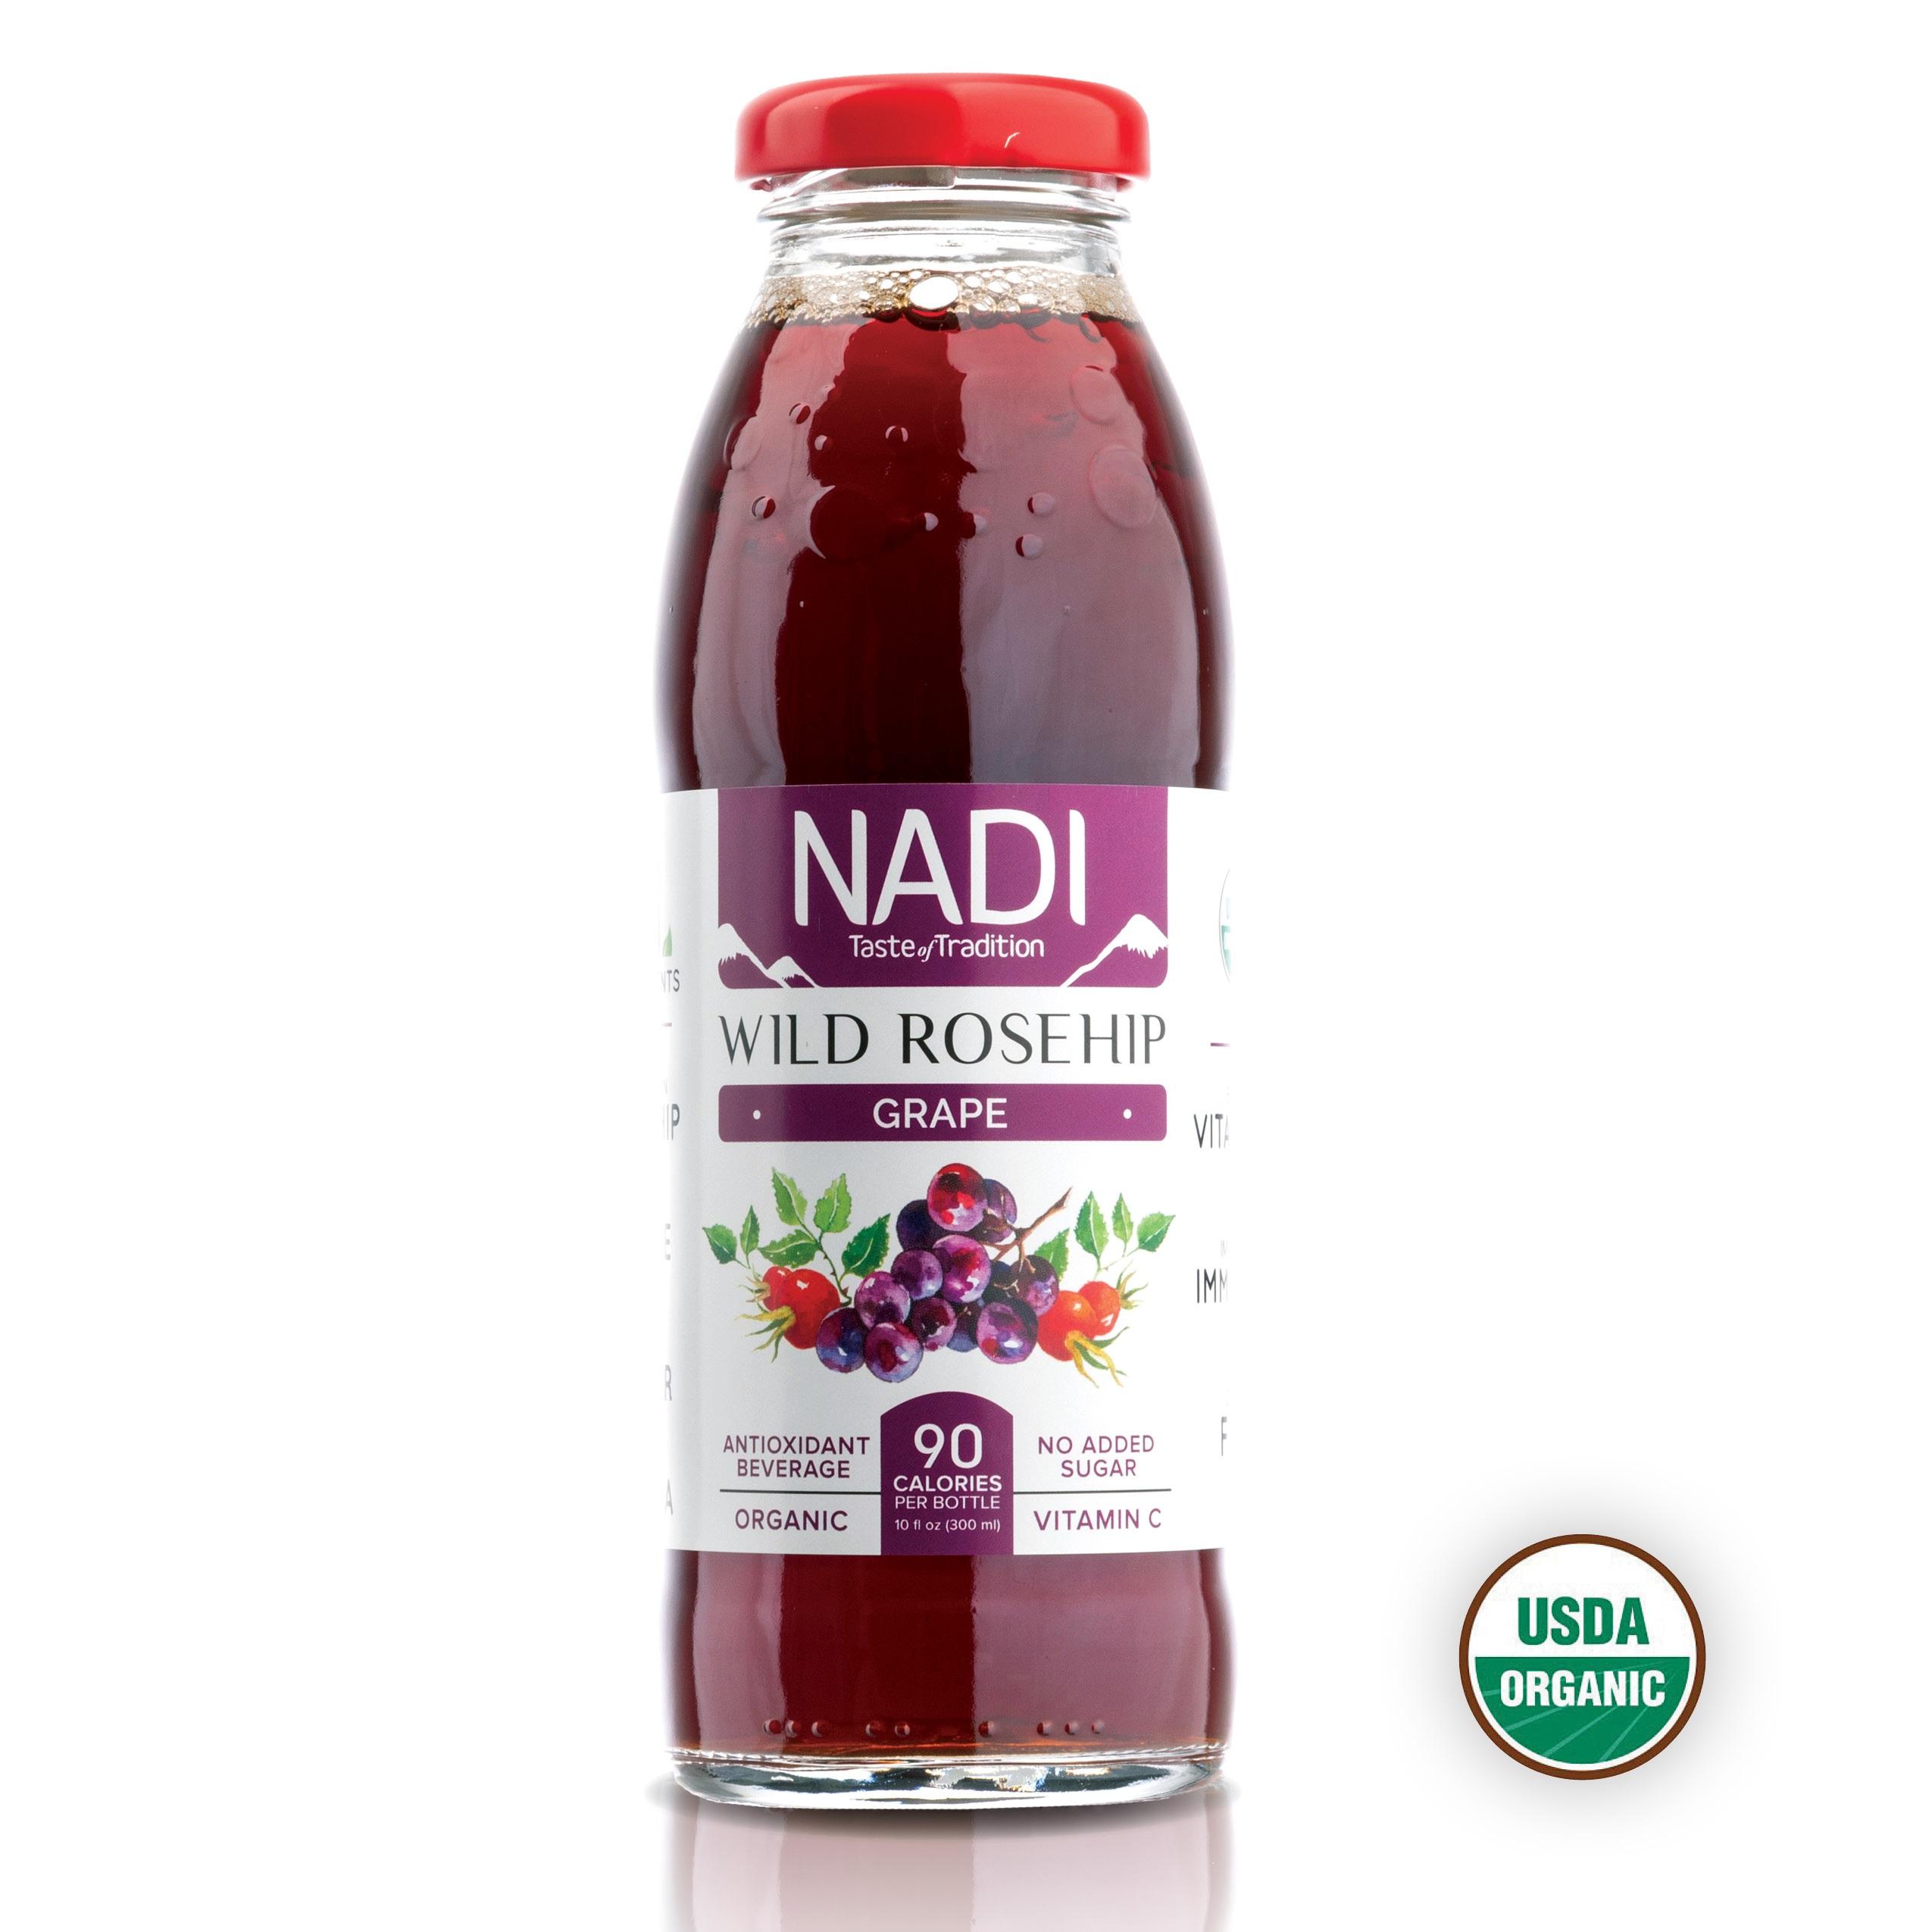 Photo of Organic Wild Rosehip Grape Antioxidant Beverage - NADI (uploaded by company)